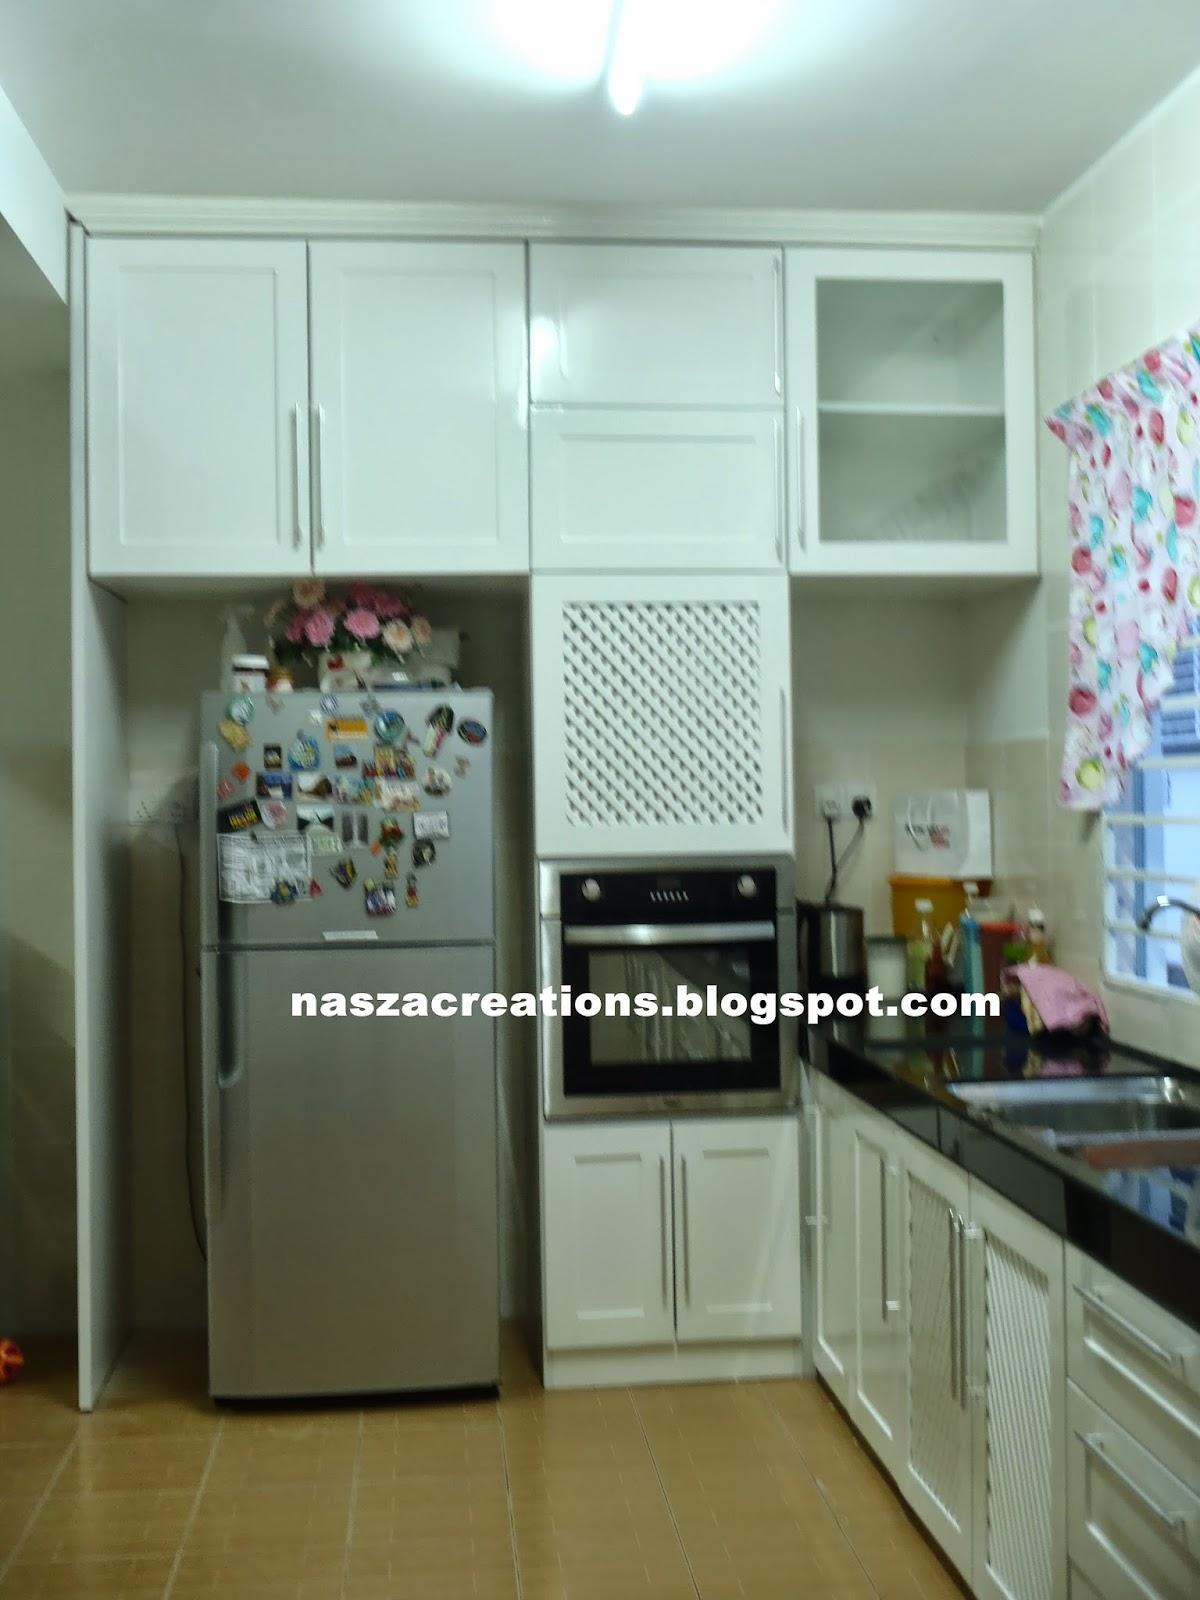 NASZA CREATIONS: White Solid Nyatoh Kitchen